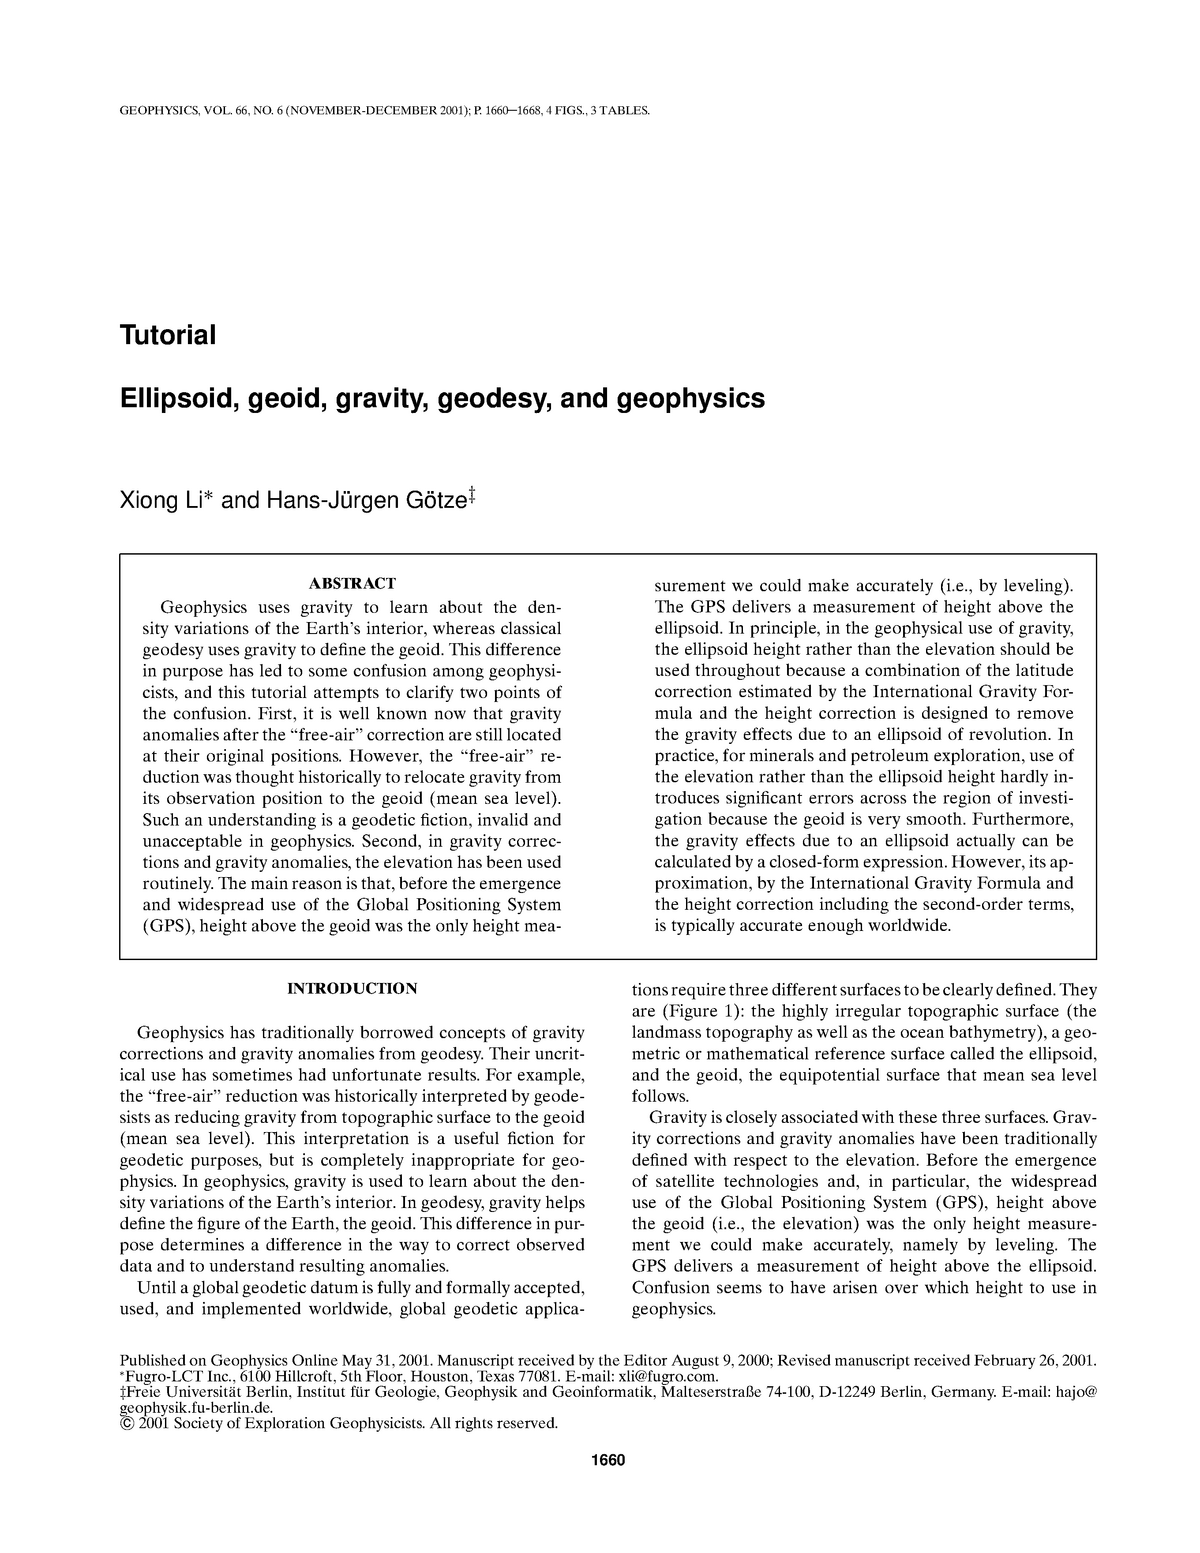 Li G Tut - Tutorial Ellipsoid, geoid, gravity, geodesy, and